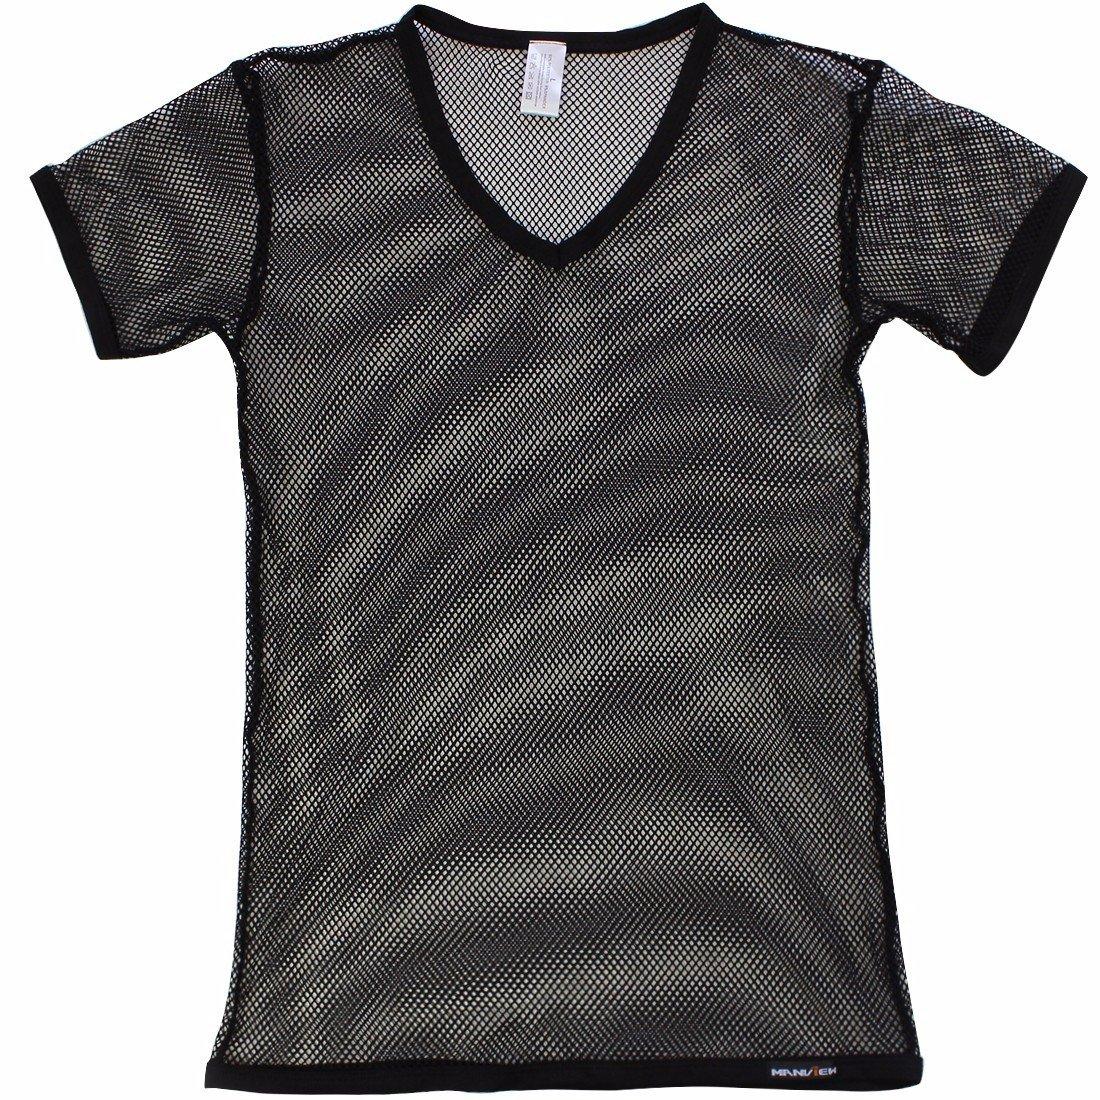 982f7ac6be6b25 iEFiEL Men Fashion Sexy Mesh See Through T-Shirt Gym Training Workout Tank  Top Vest Shirt Clubwear at Amazon Men s Clothing store